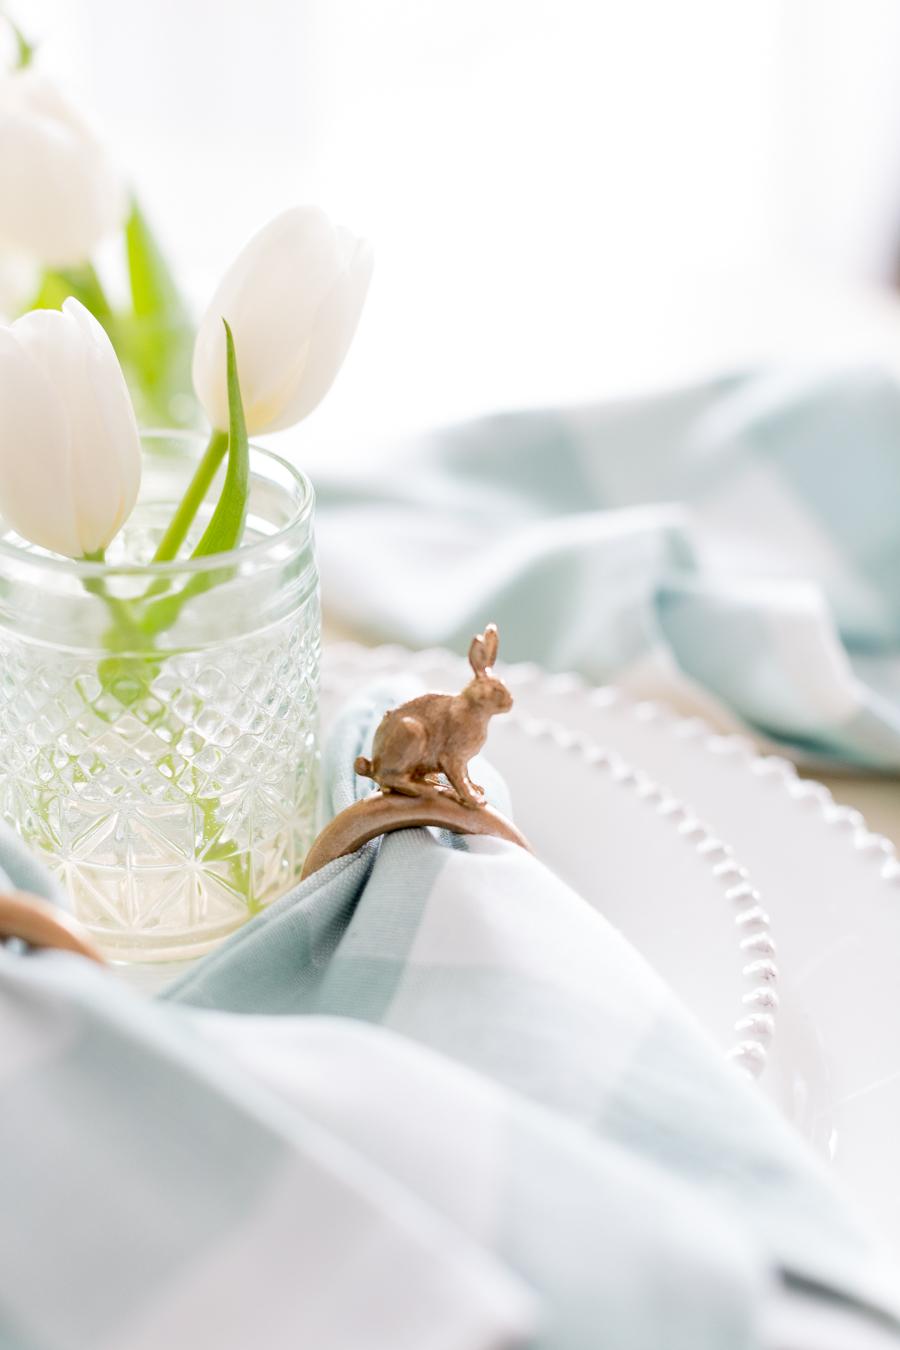 Diy easter bunny napkin ring easter bunny napkin ring diy craftberrybush 7 solutioingenieria Choice Image